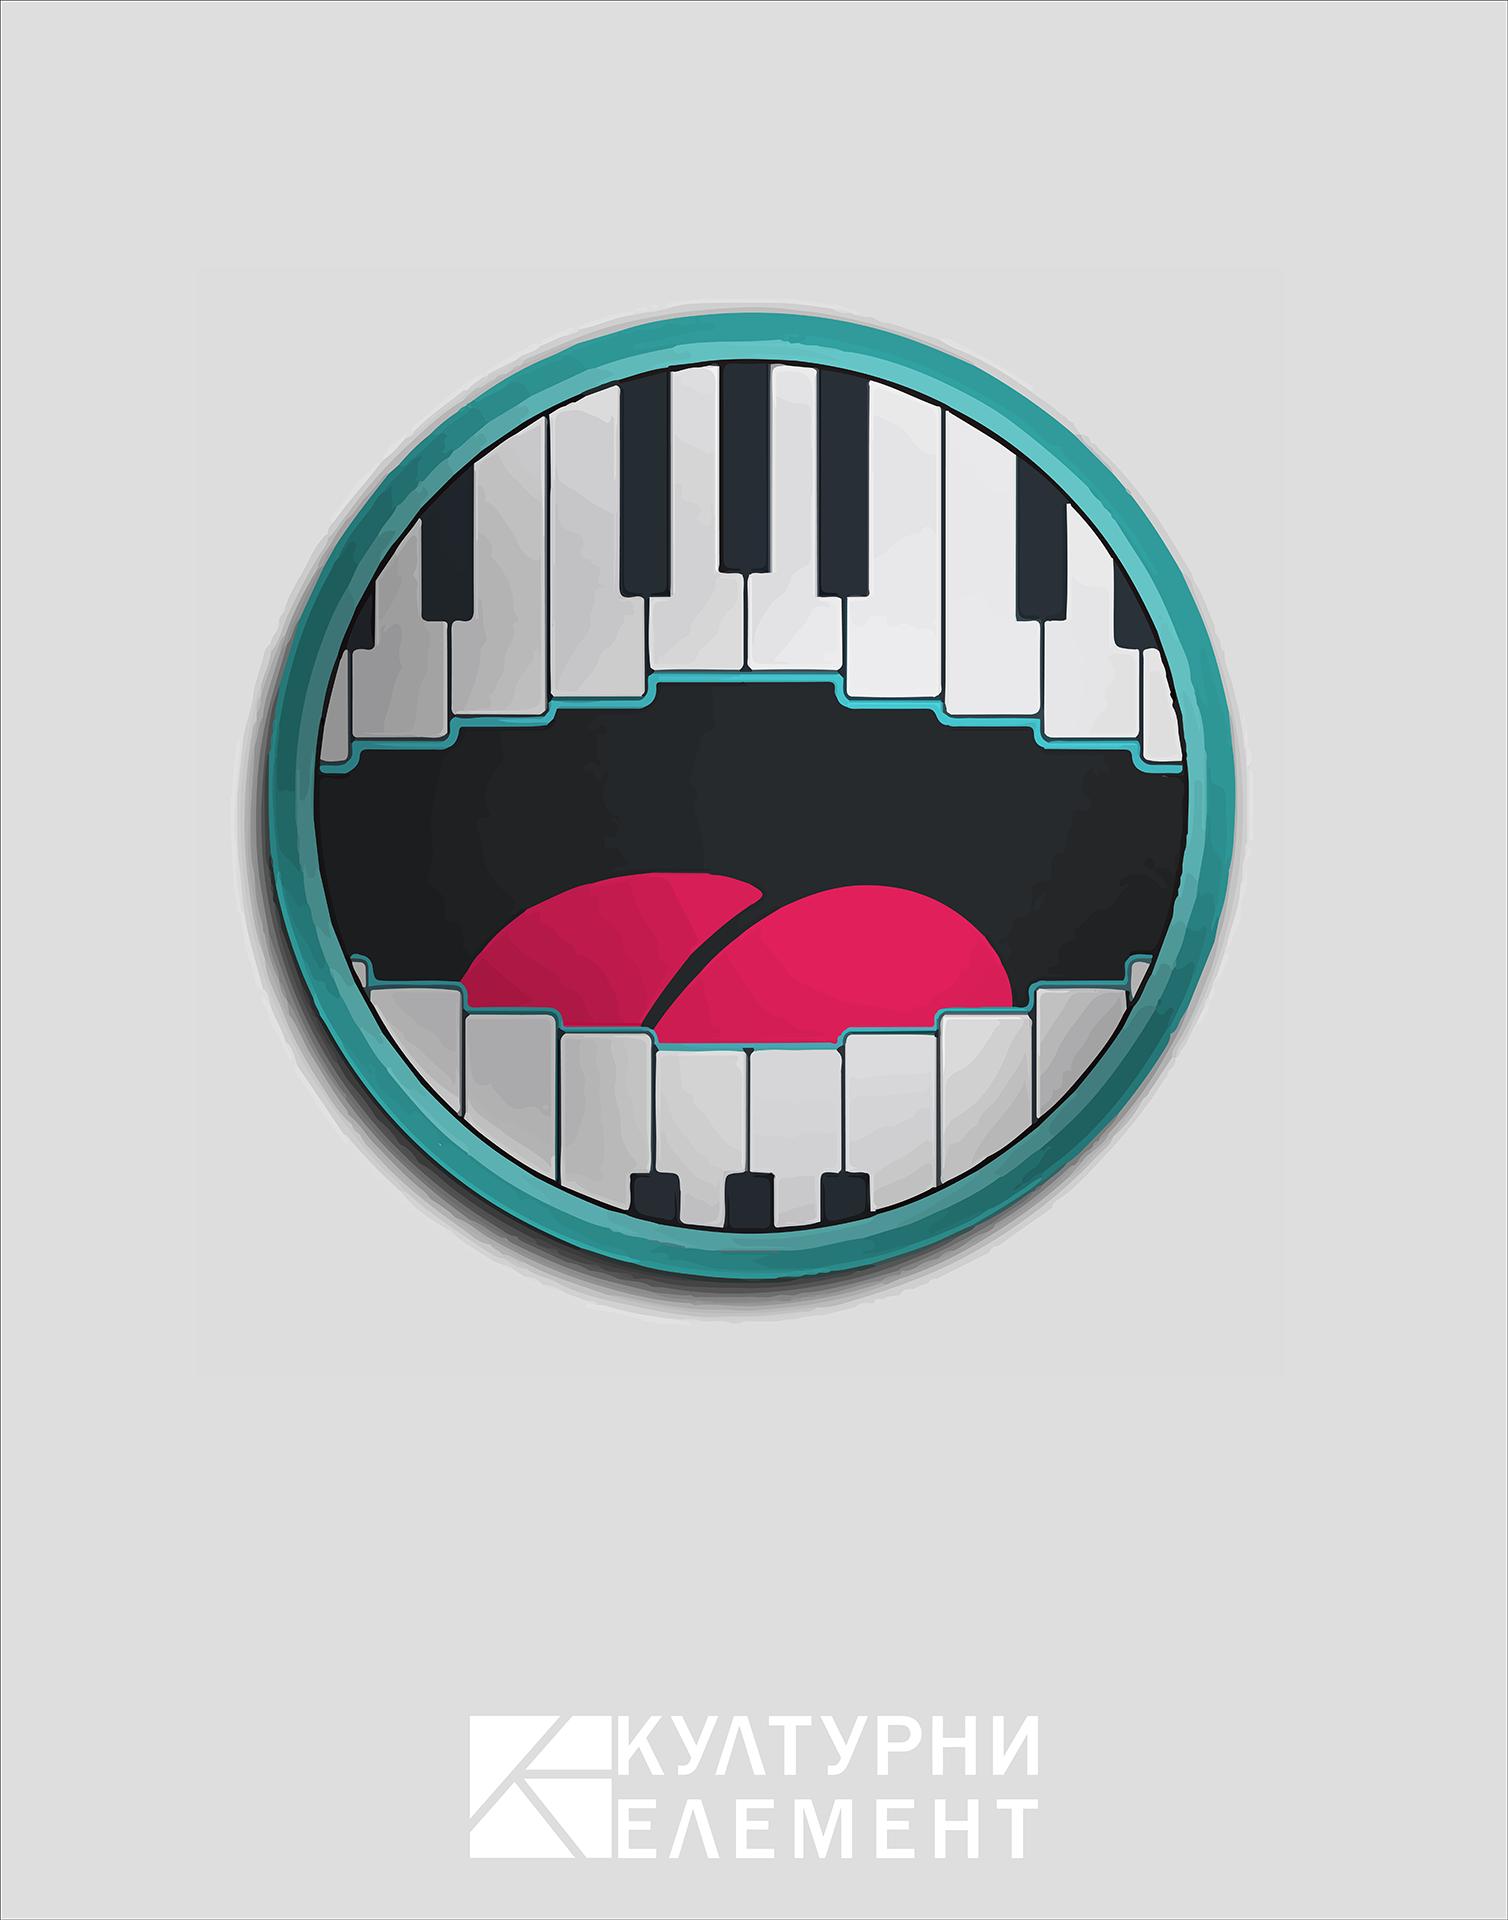 Bedž klavir